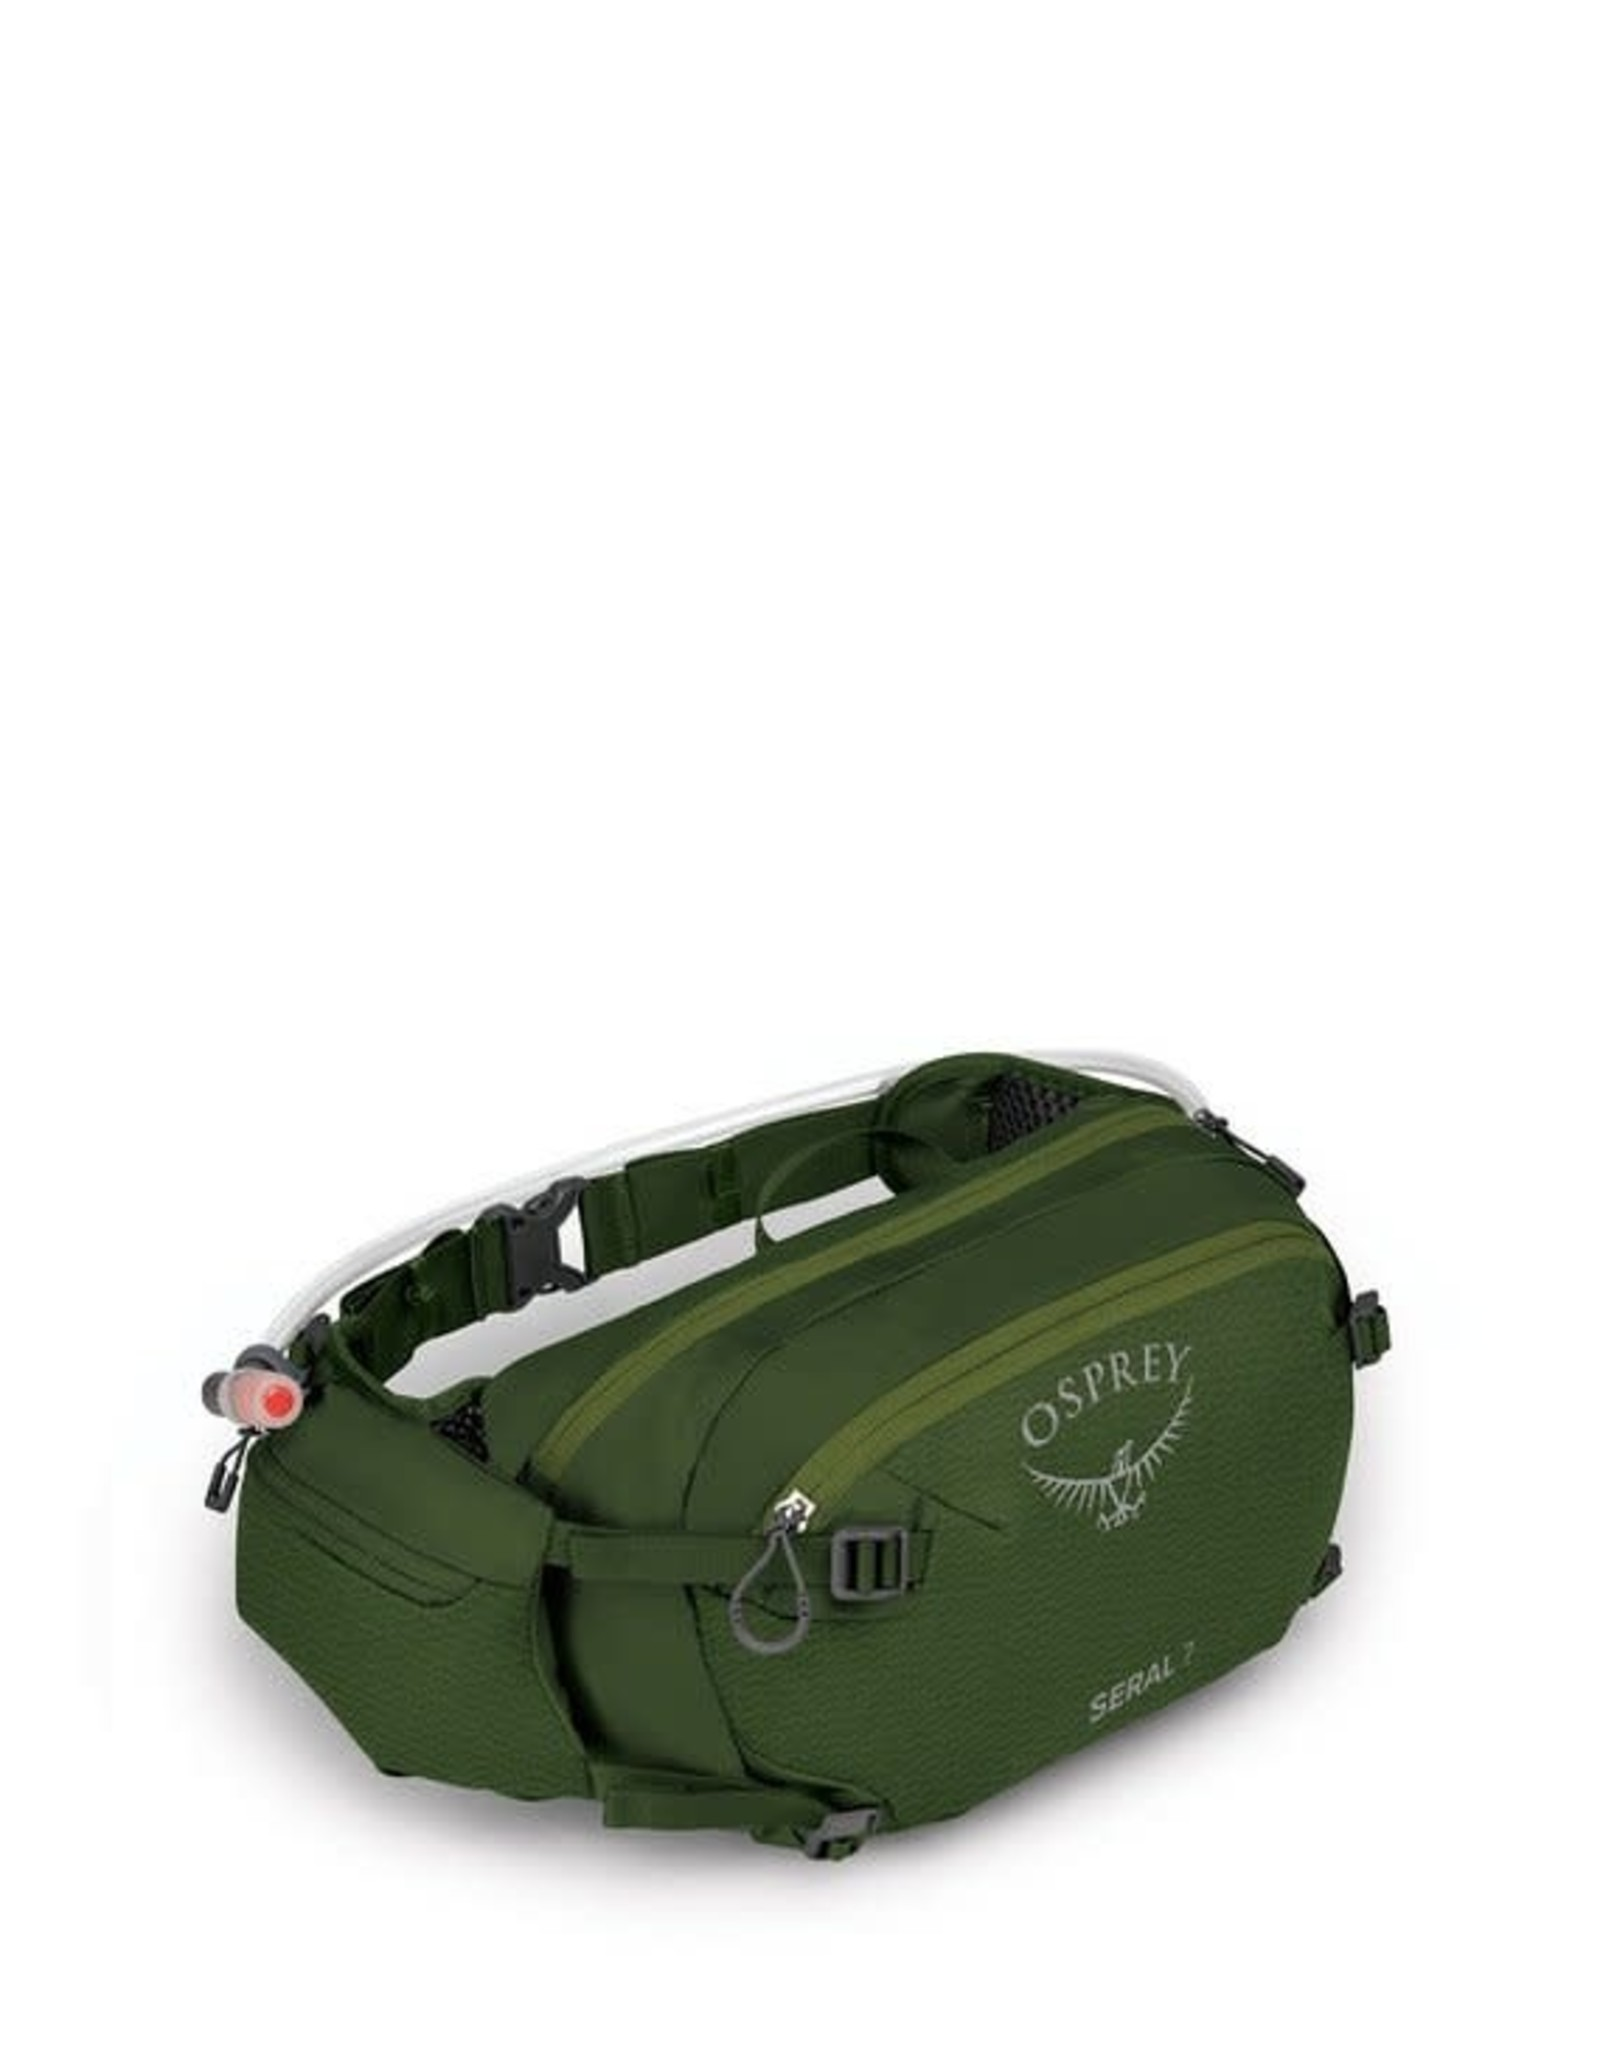 Osprey Seral 7 Lumbar Pack - Green, One Size